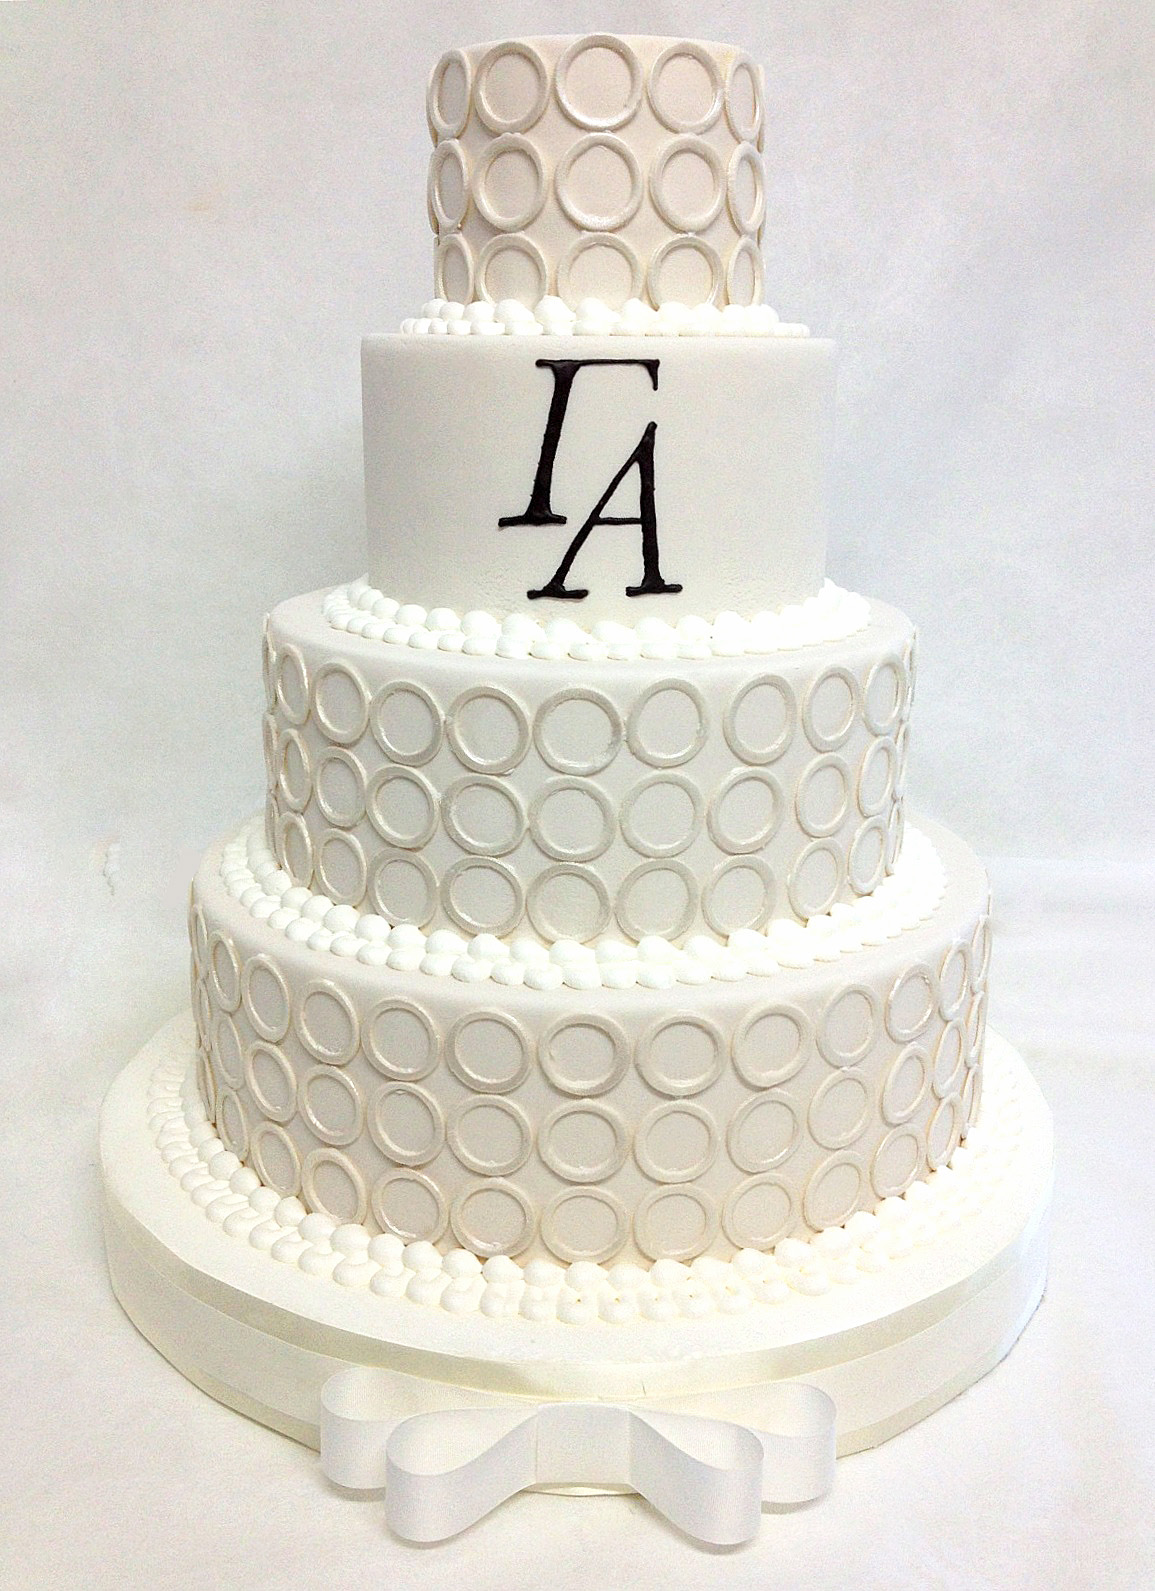 Photo 3 MODERN RINGS AND MONOGRAM WEDDING CAKE